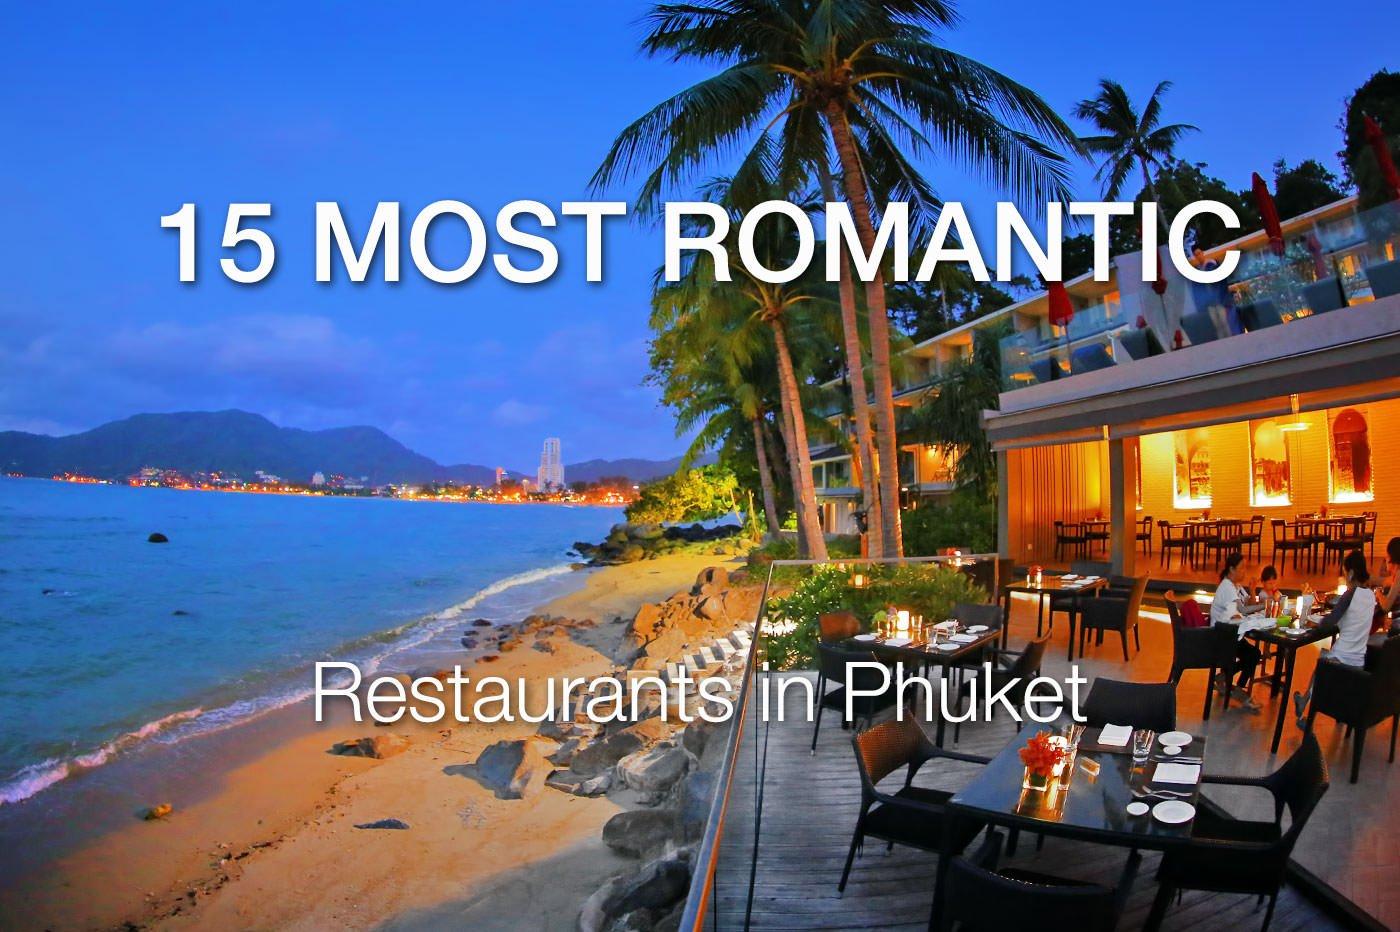 15 Great Romantic Restaurants in Phuket (Updated) – Valentine's Day in Phuket